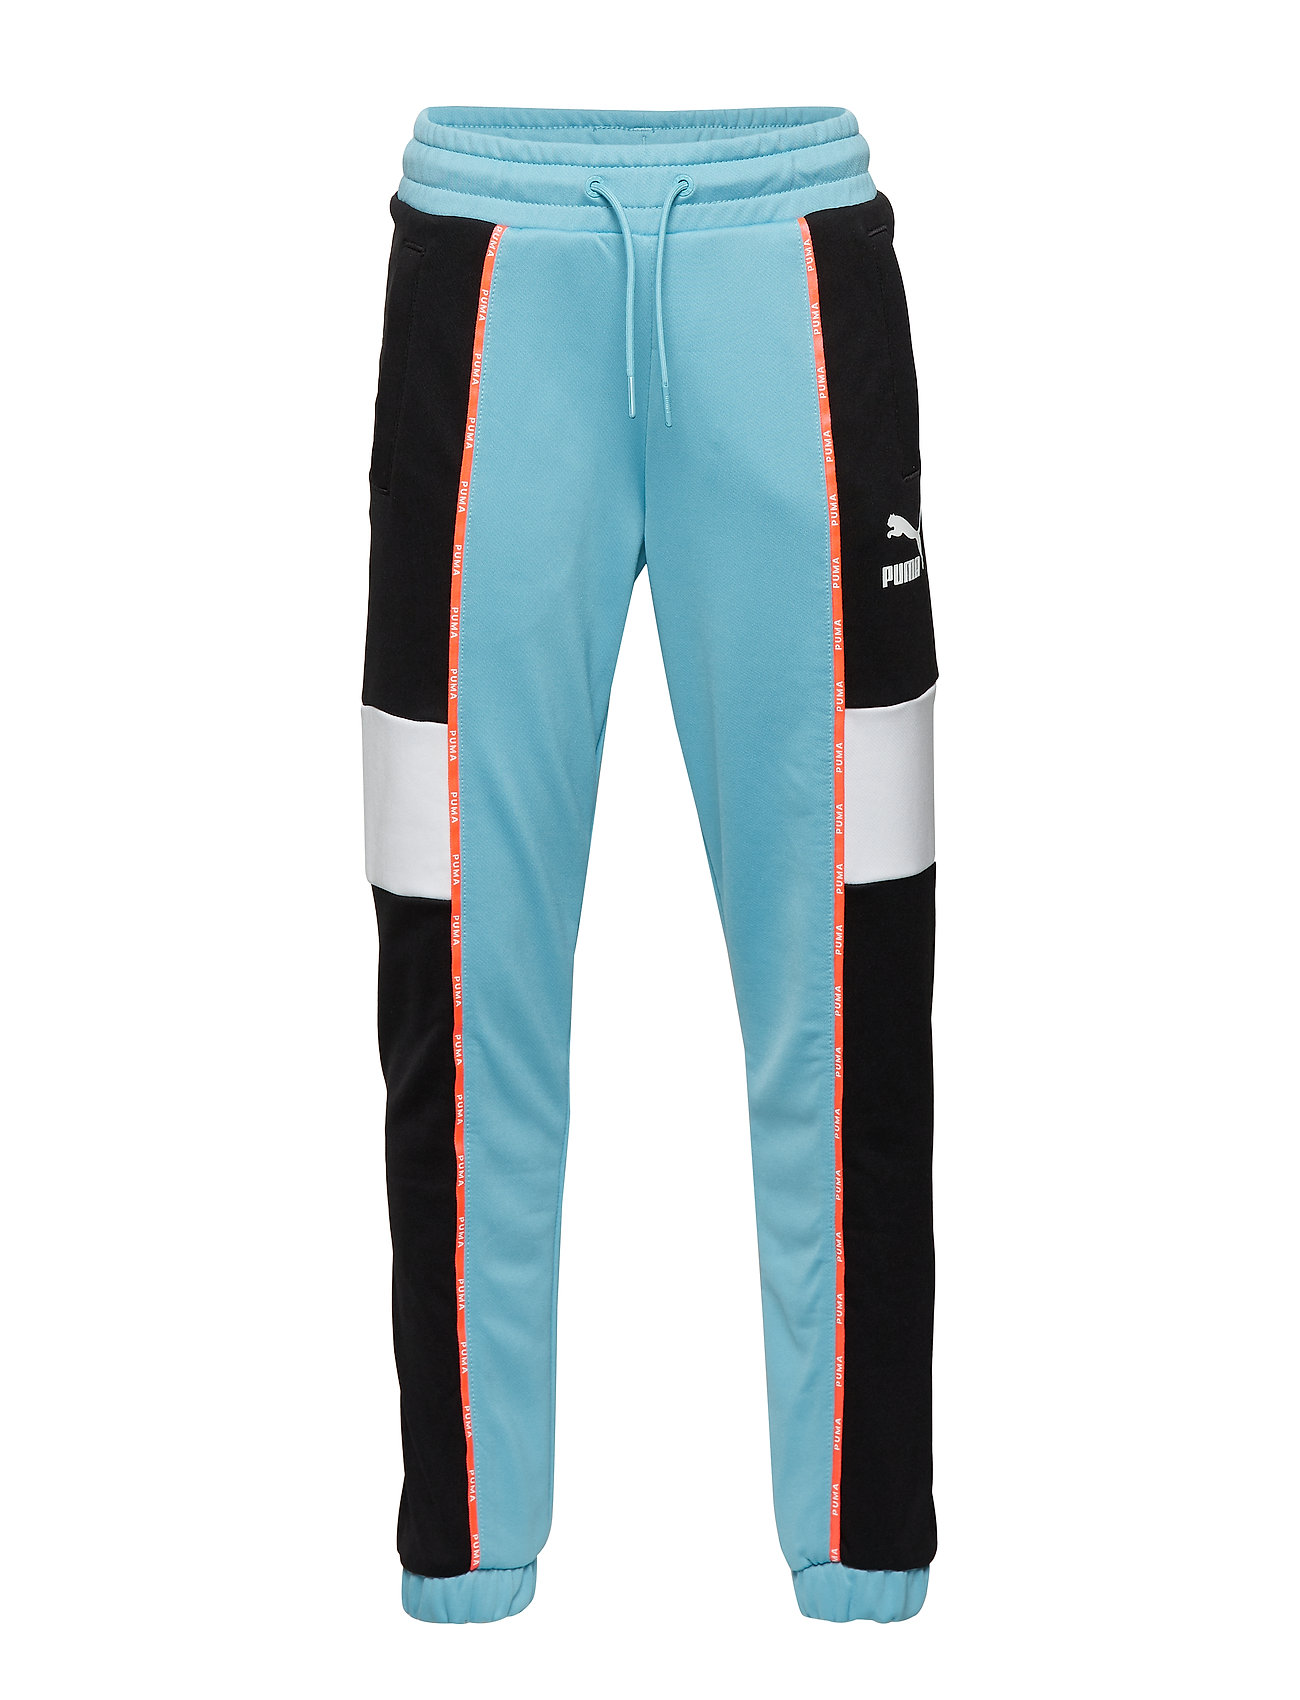 PUMA XTG Track Pants G - MILKY BLUE